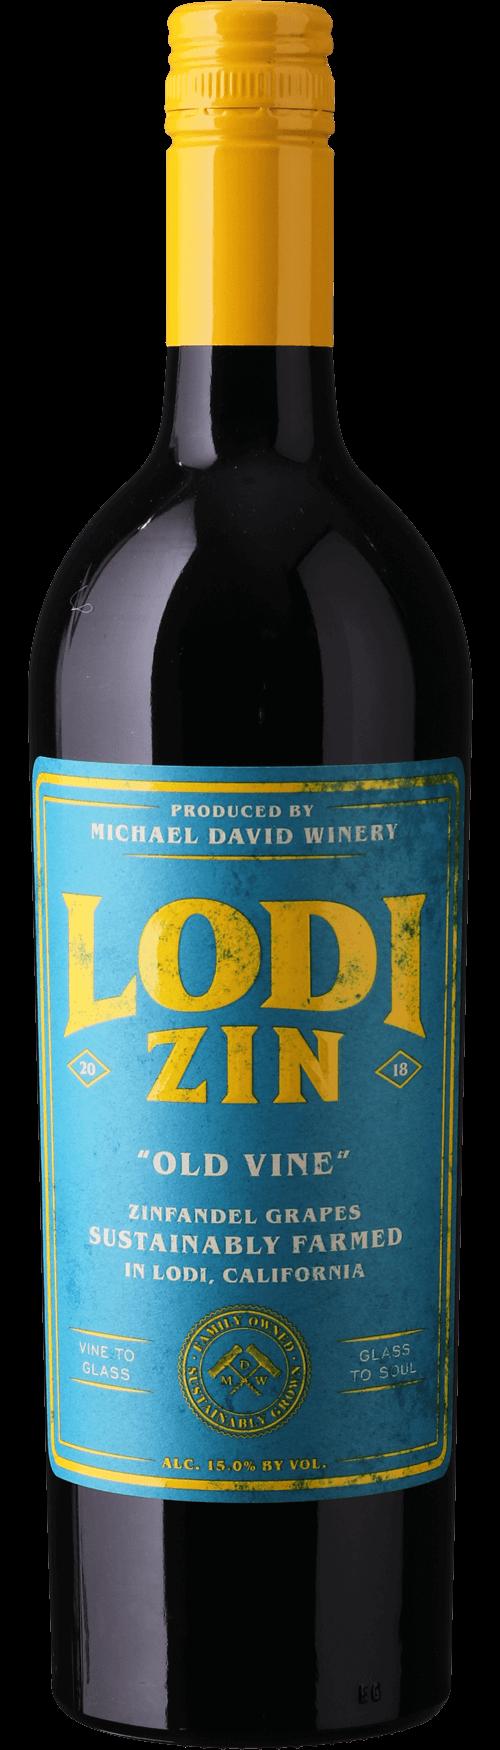 Michael David Winery Lodi Zin Old Vine Zinfandel 2018 75 cl